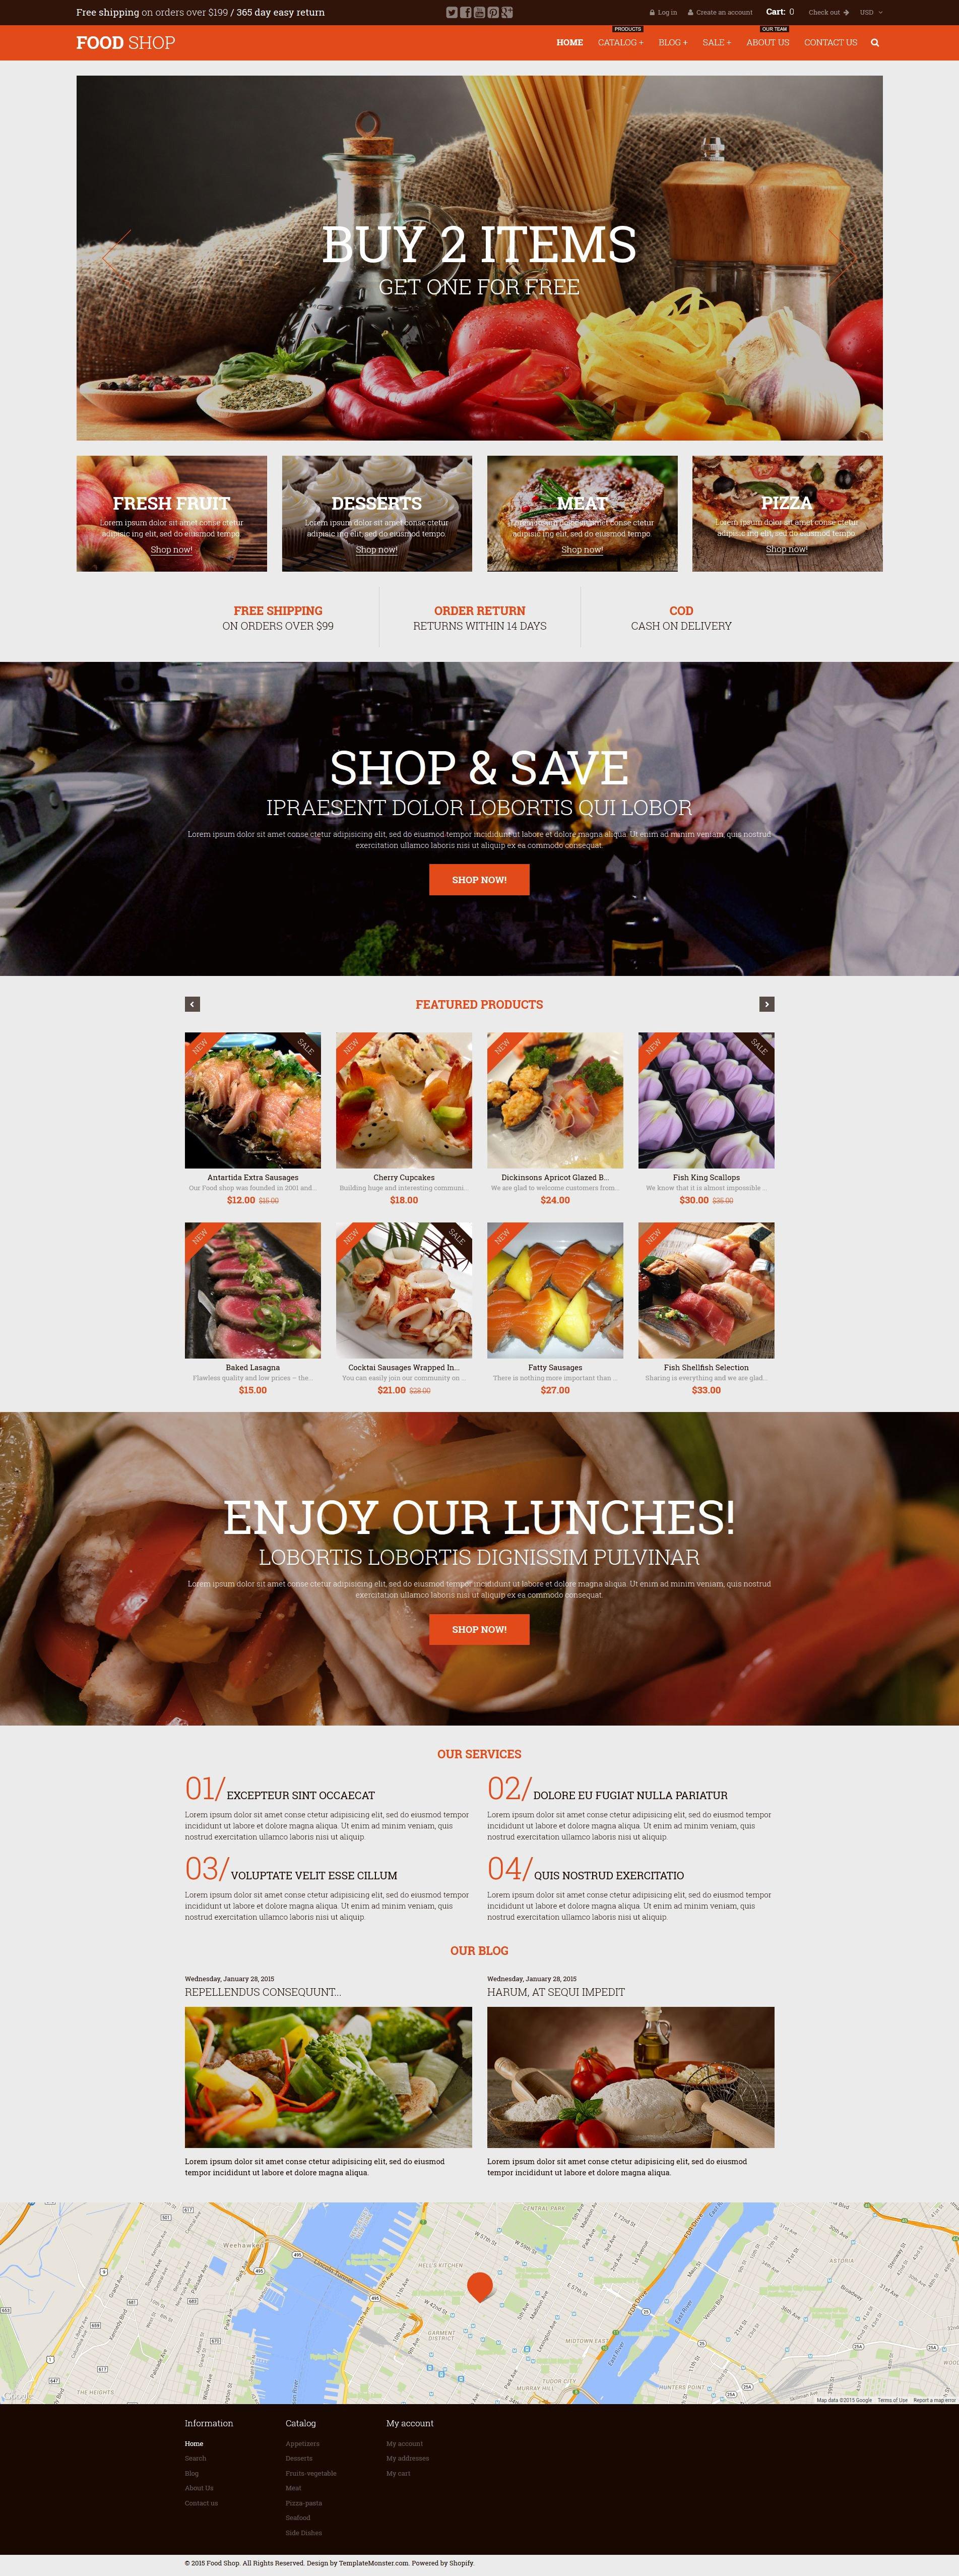 Food Shop Shopify Theme - screenshot